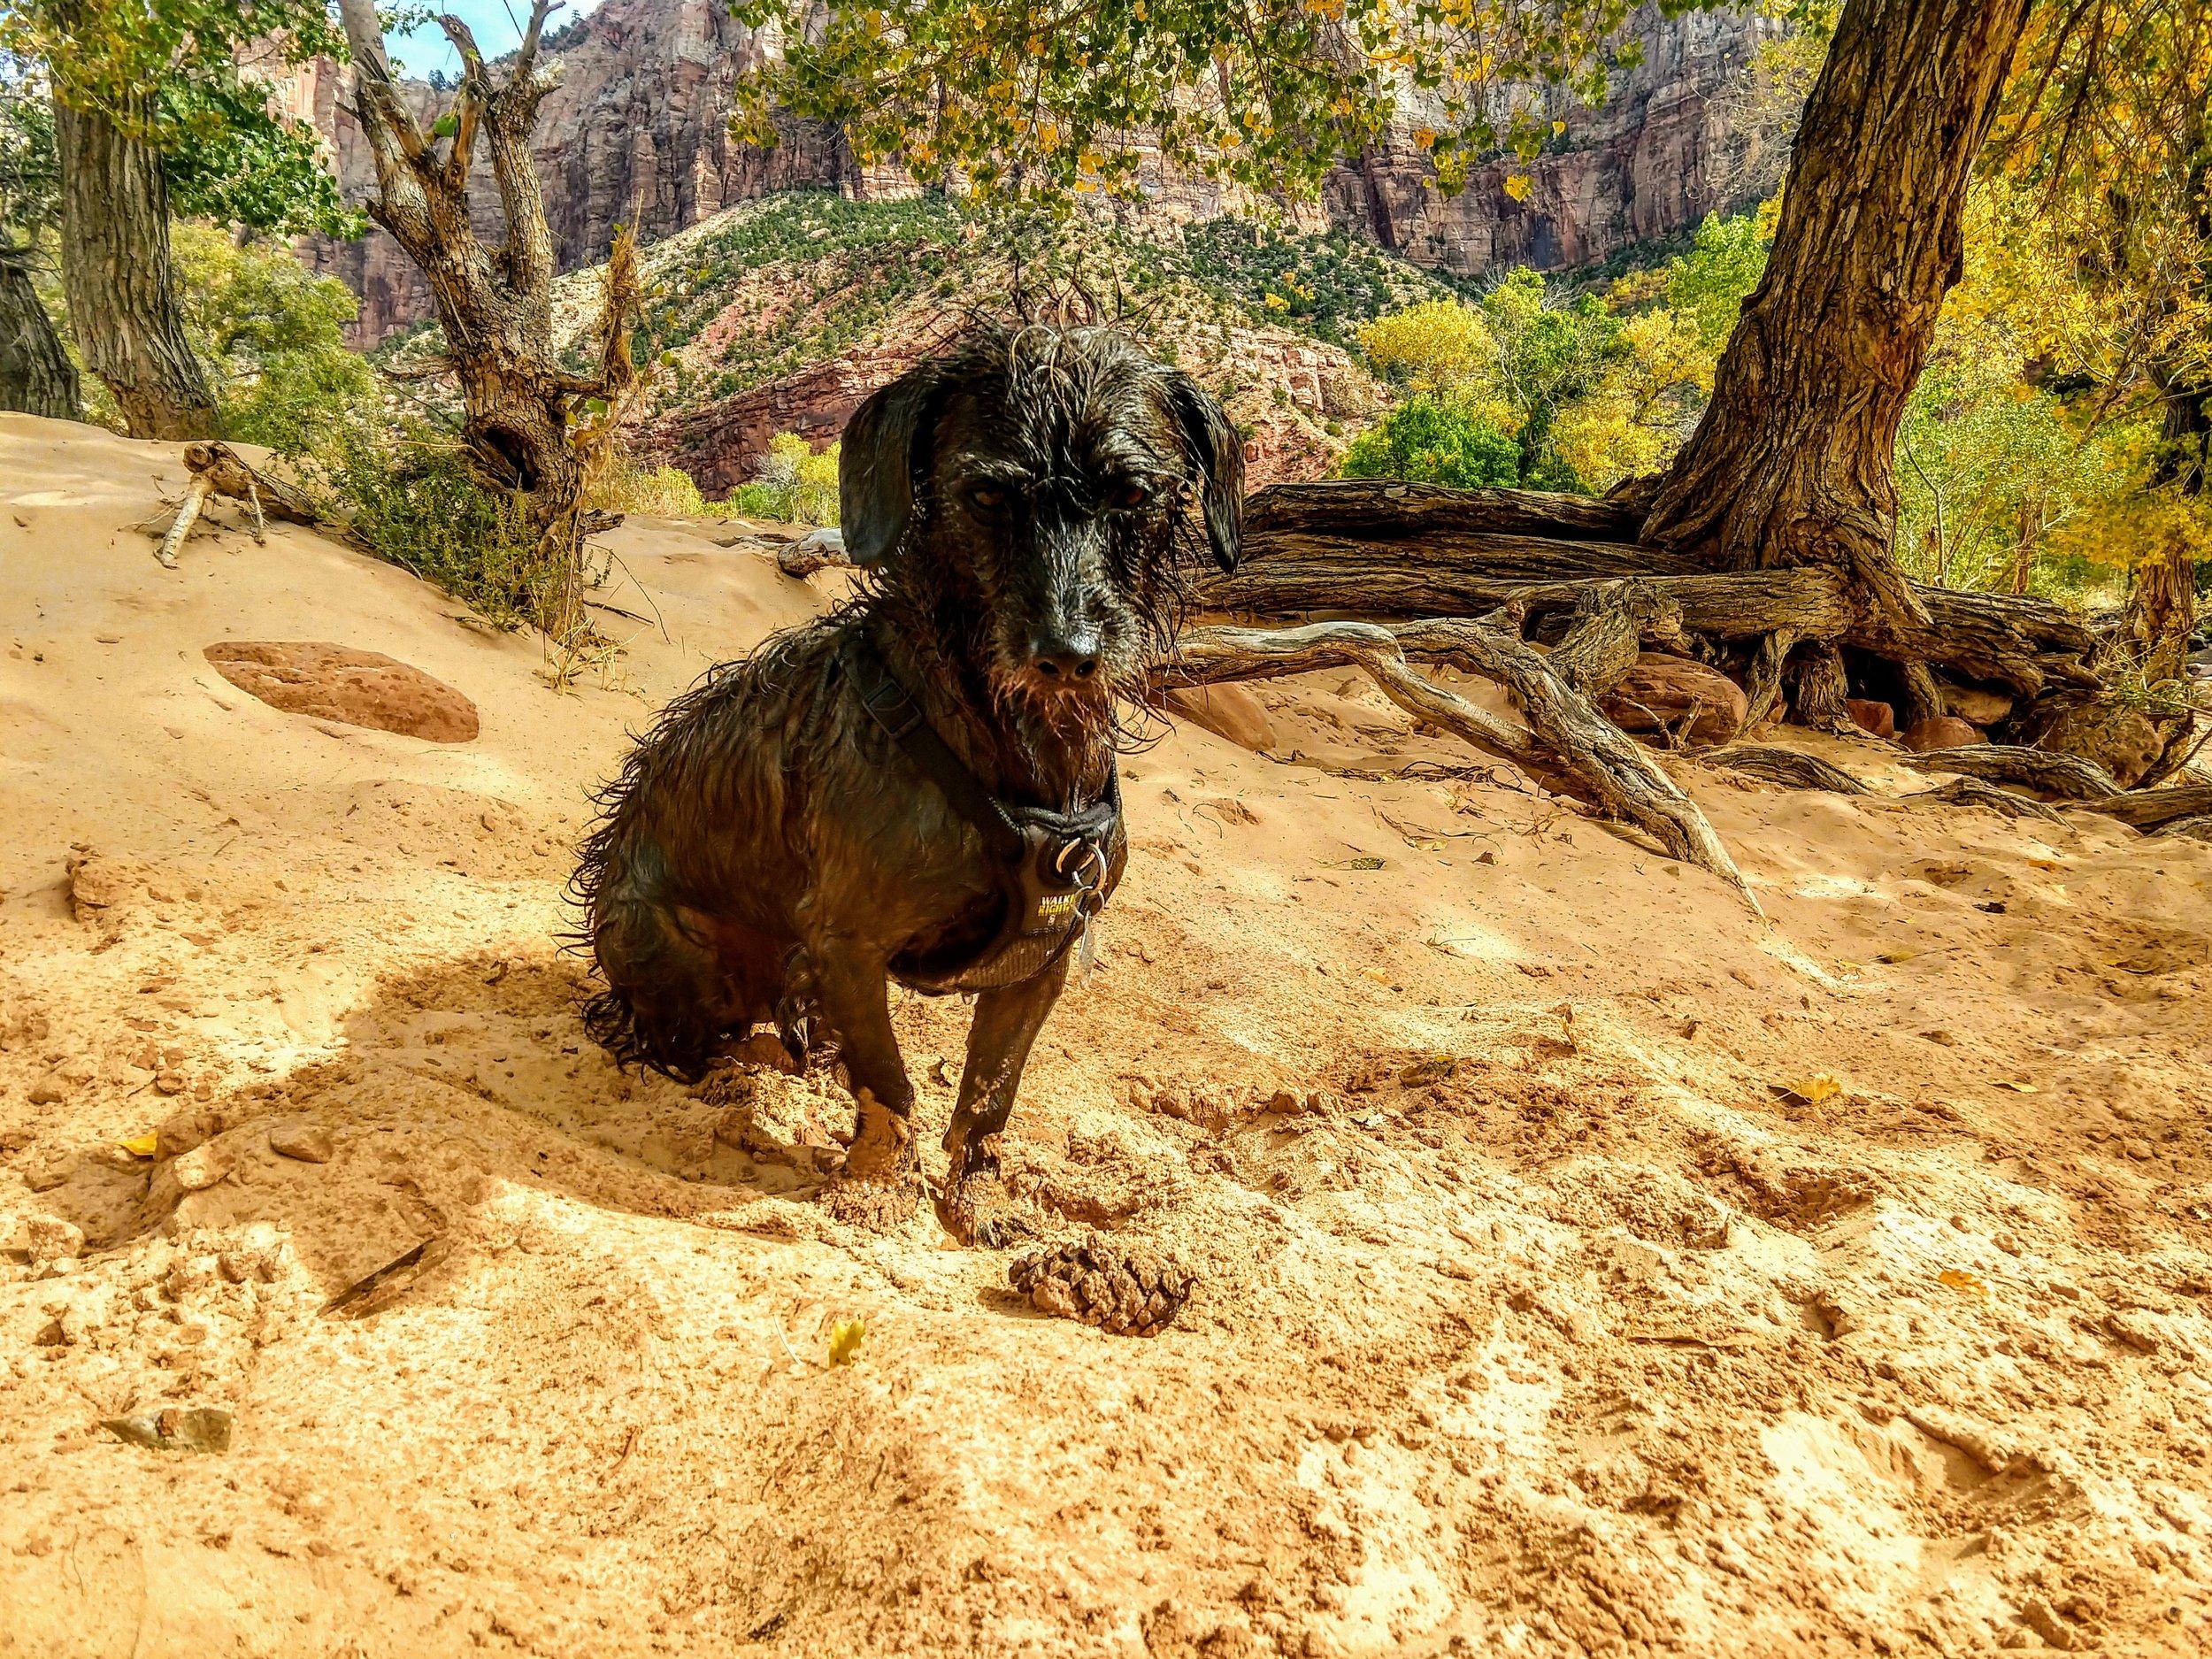 Zion National Park, a regal stare down.